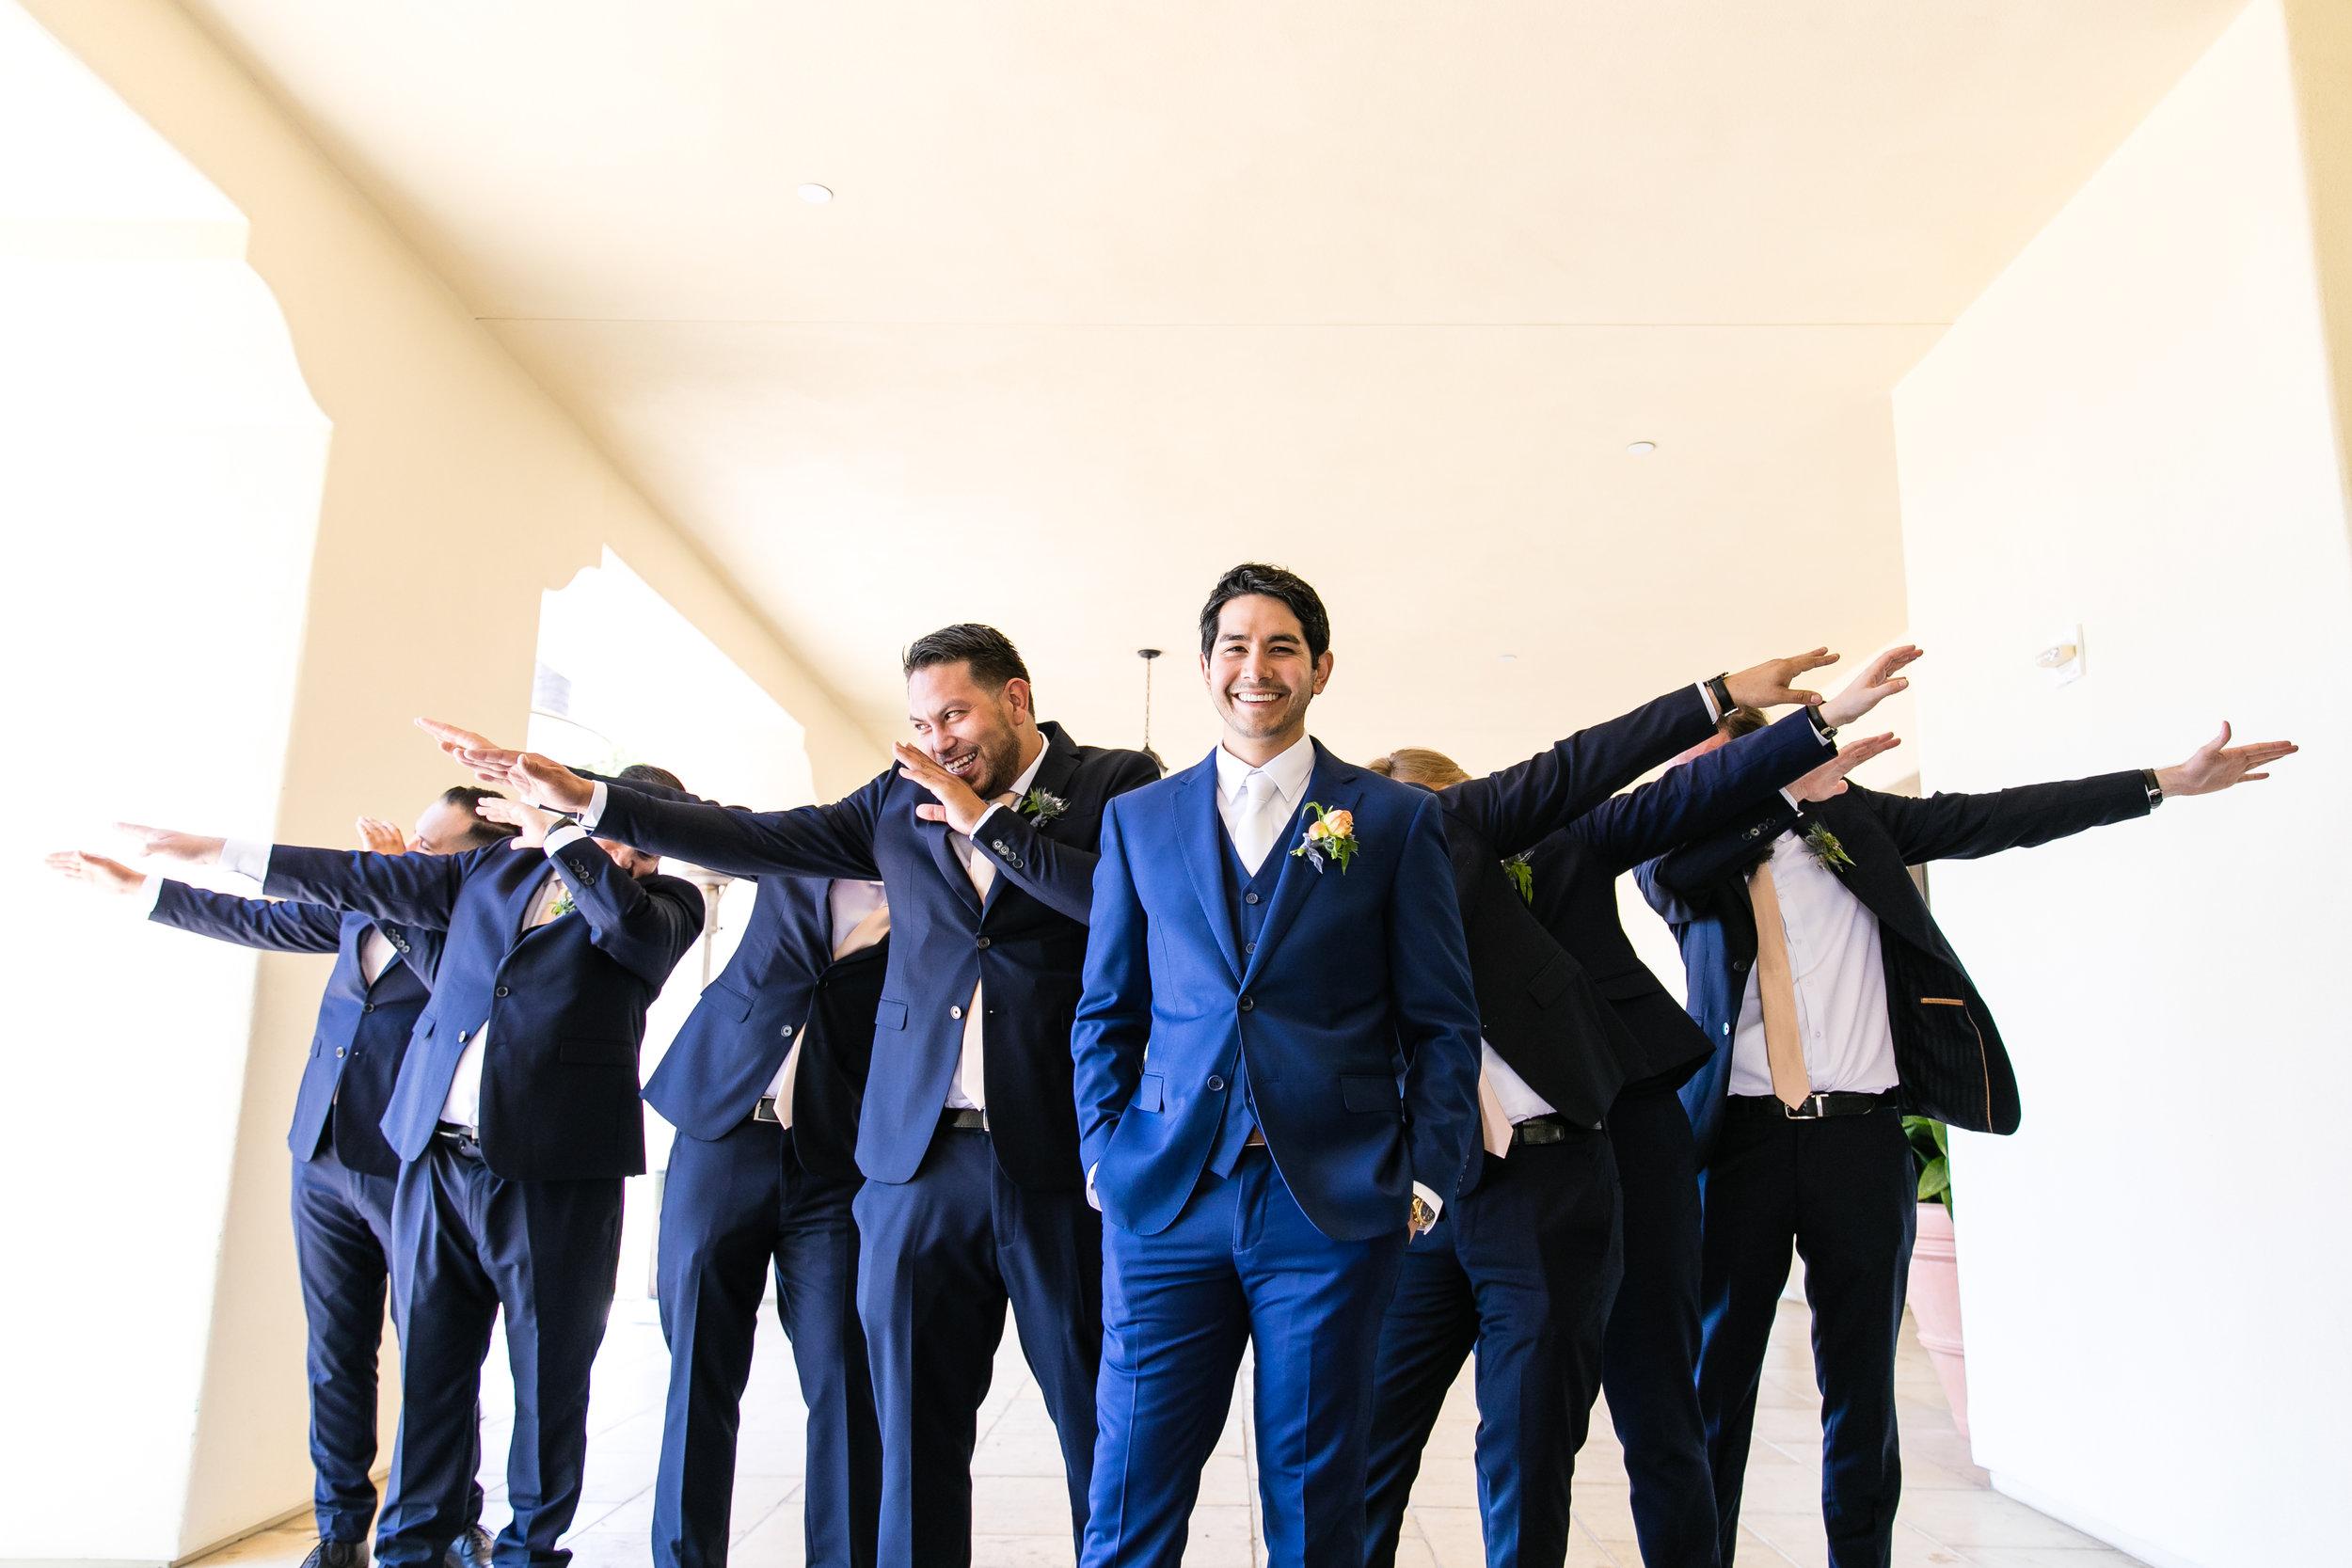 2019_05_24_Wedding_Barajas_0214.jpg